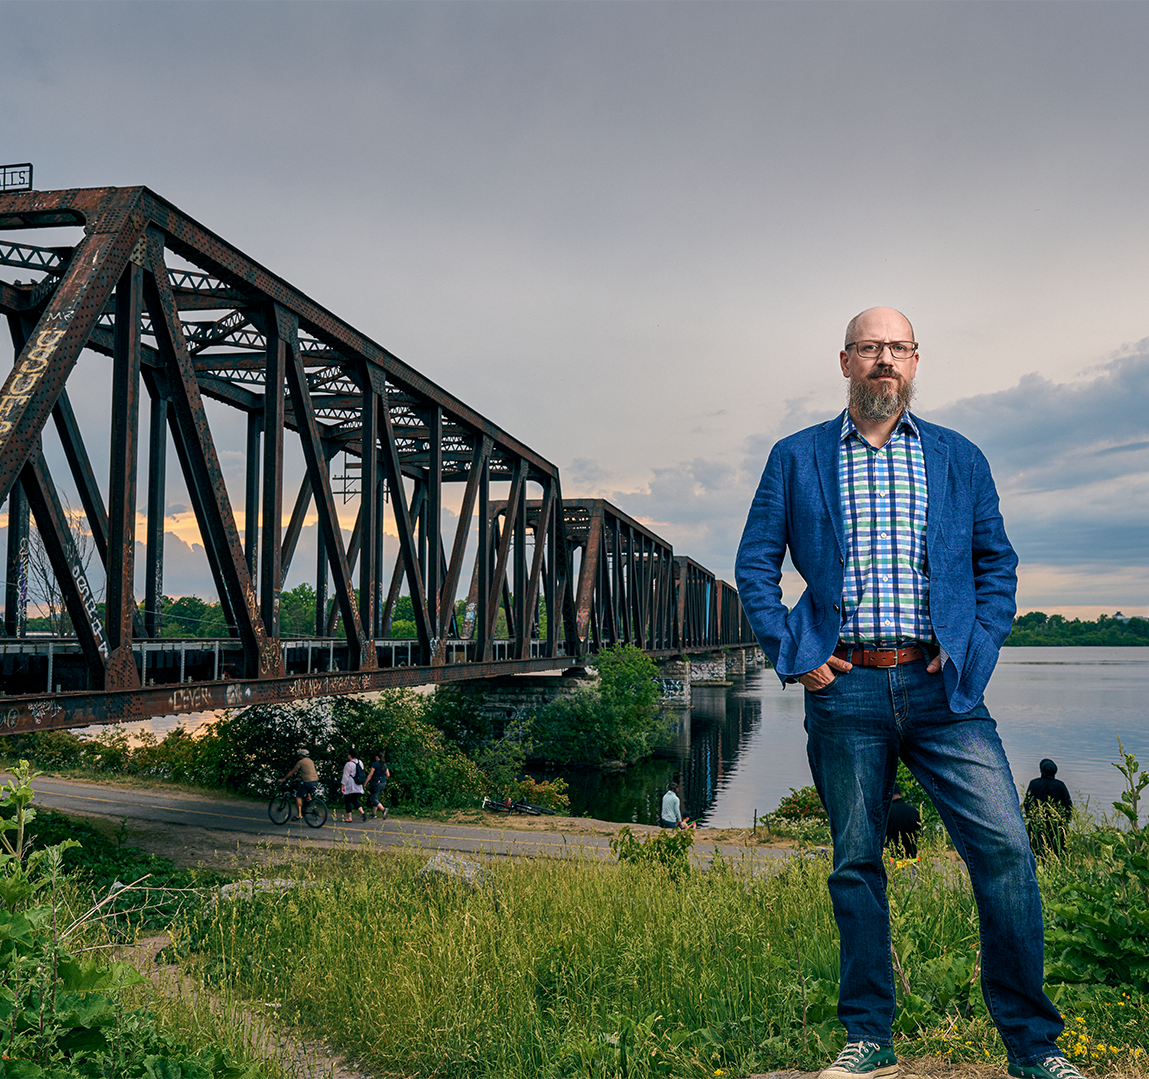 Portrait of Michael Spratt standing on grass in front of industrial bridge and water